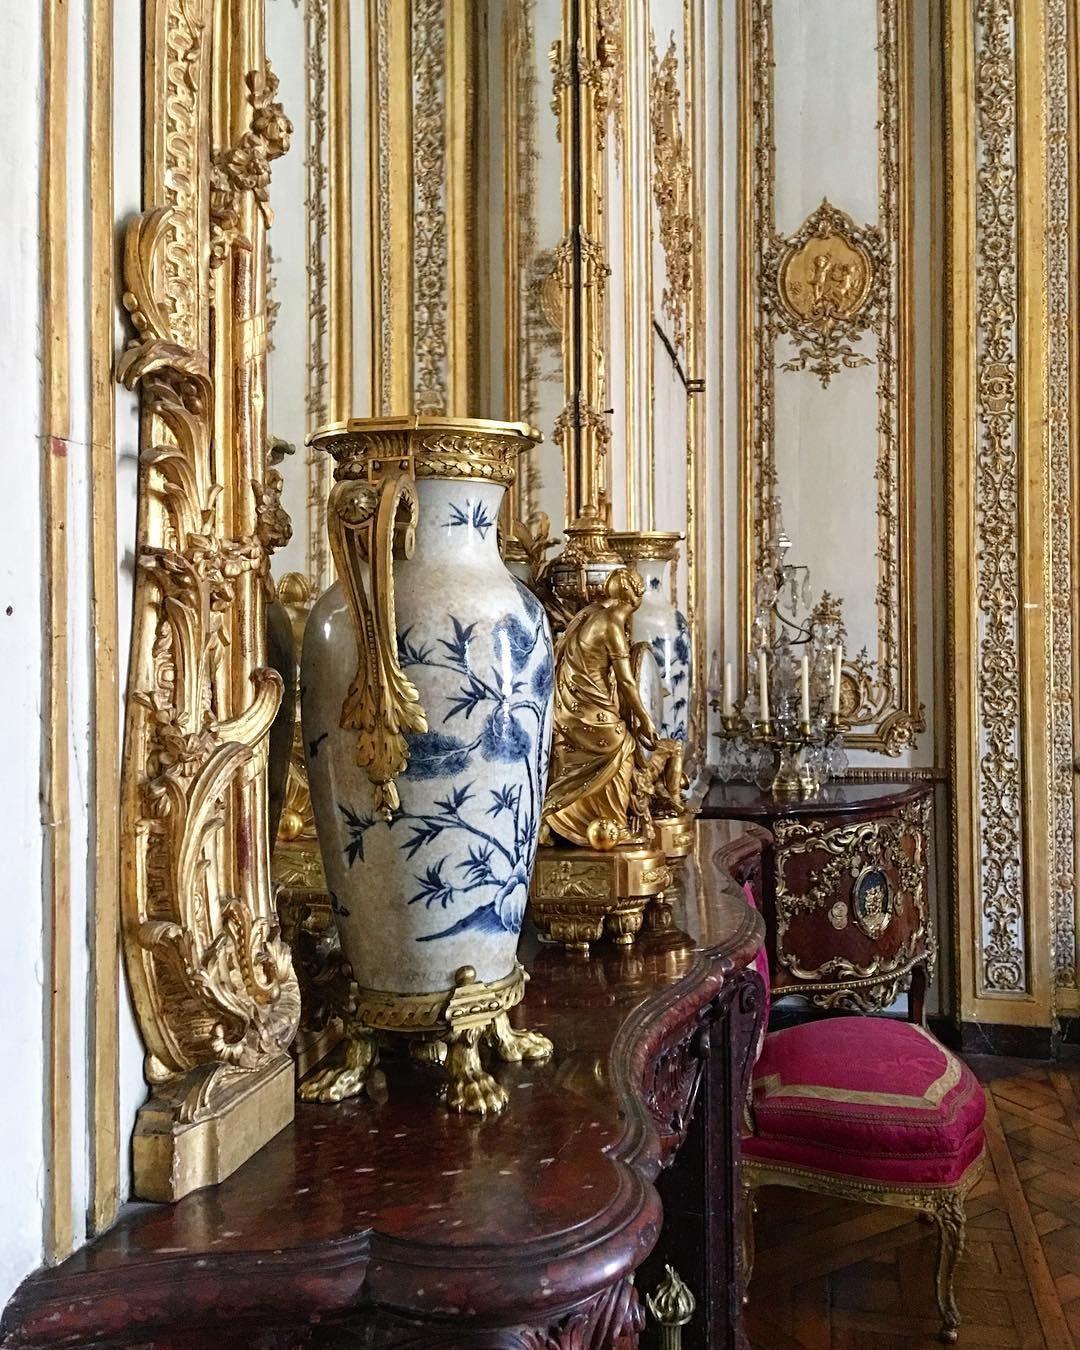 interiormarblelouisversailleschateaupalacecastle frenchcountryhousefrenchstyledecorationdecor chandeliercrystalsilkfurnituresumptuousstyle